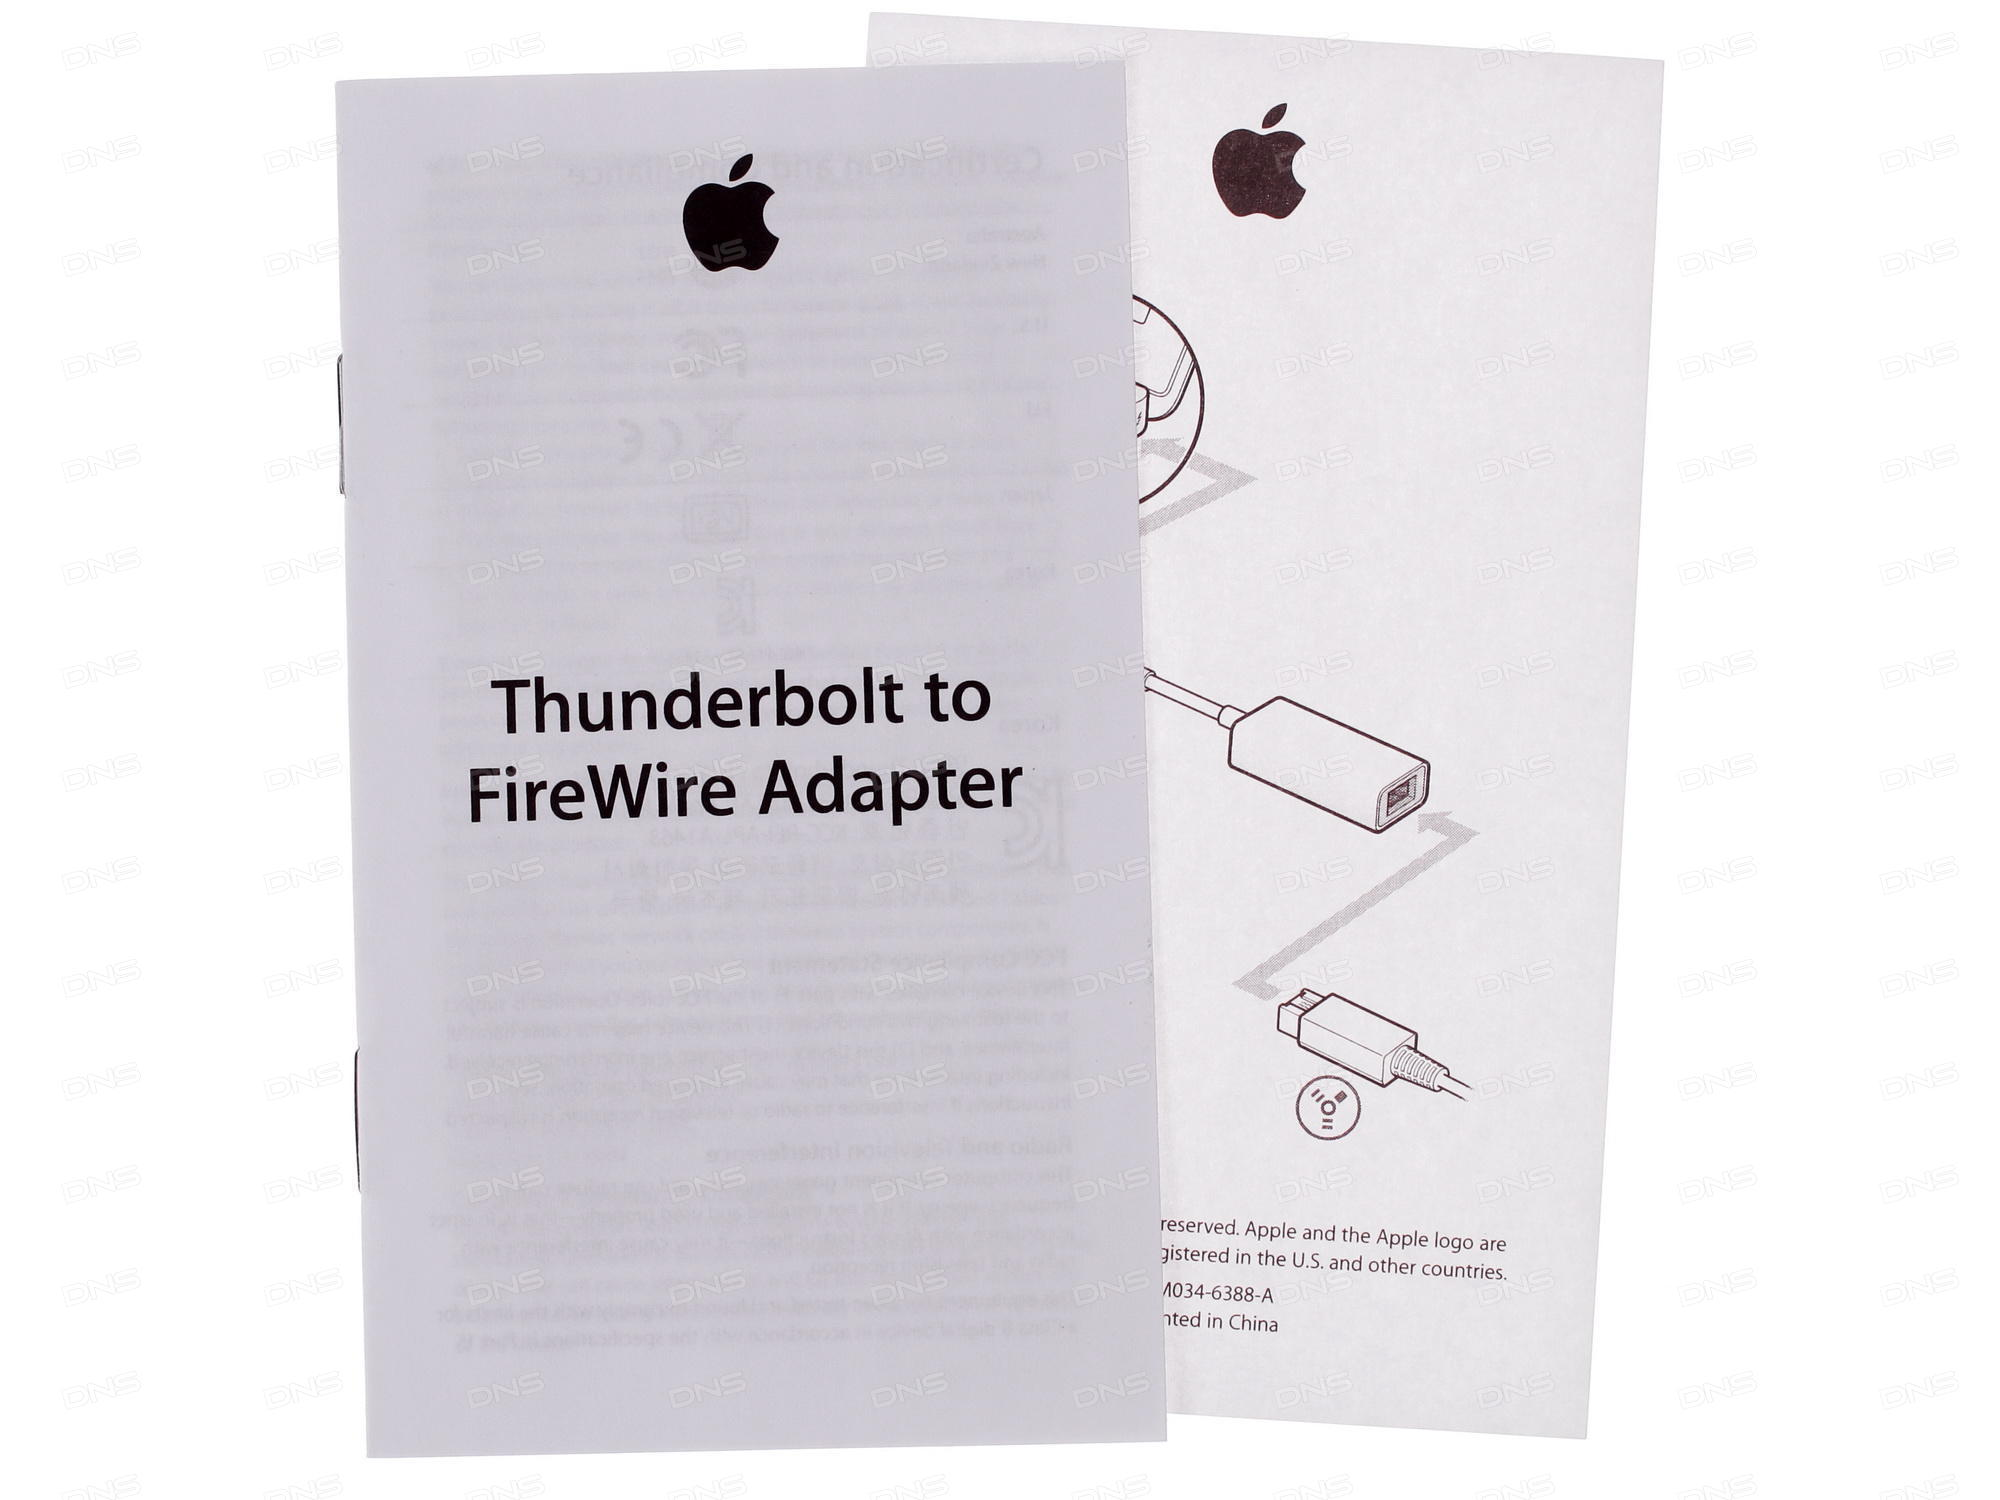 apple thunderbolt firewire ieee 1394 dns. Black Bedroom Furniture Sets. Home Design Ideas